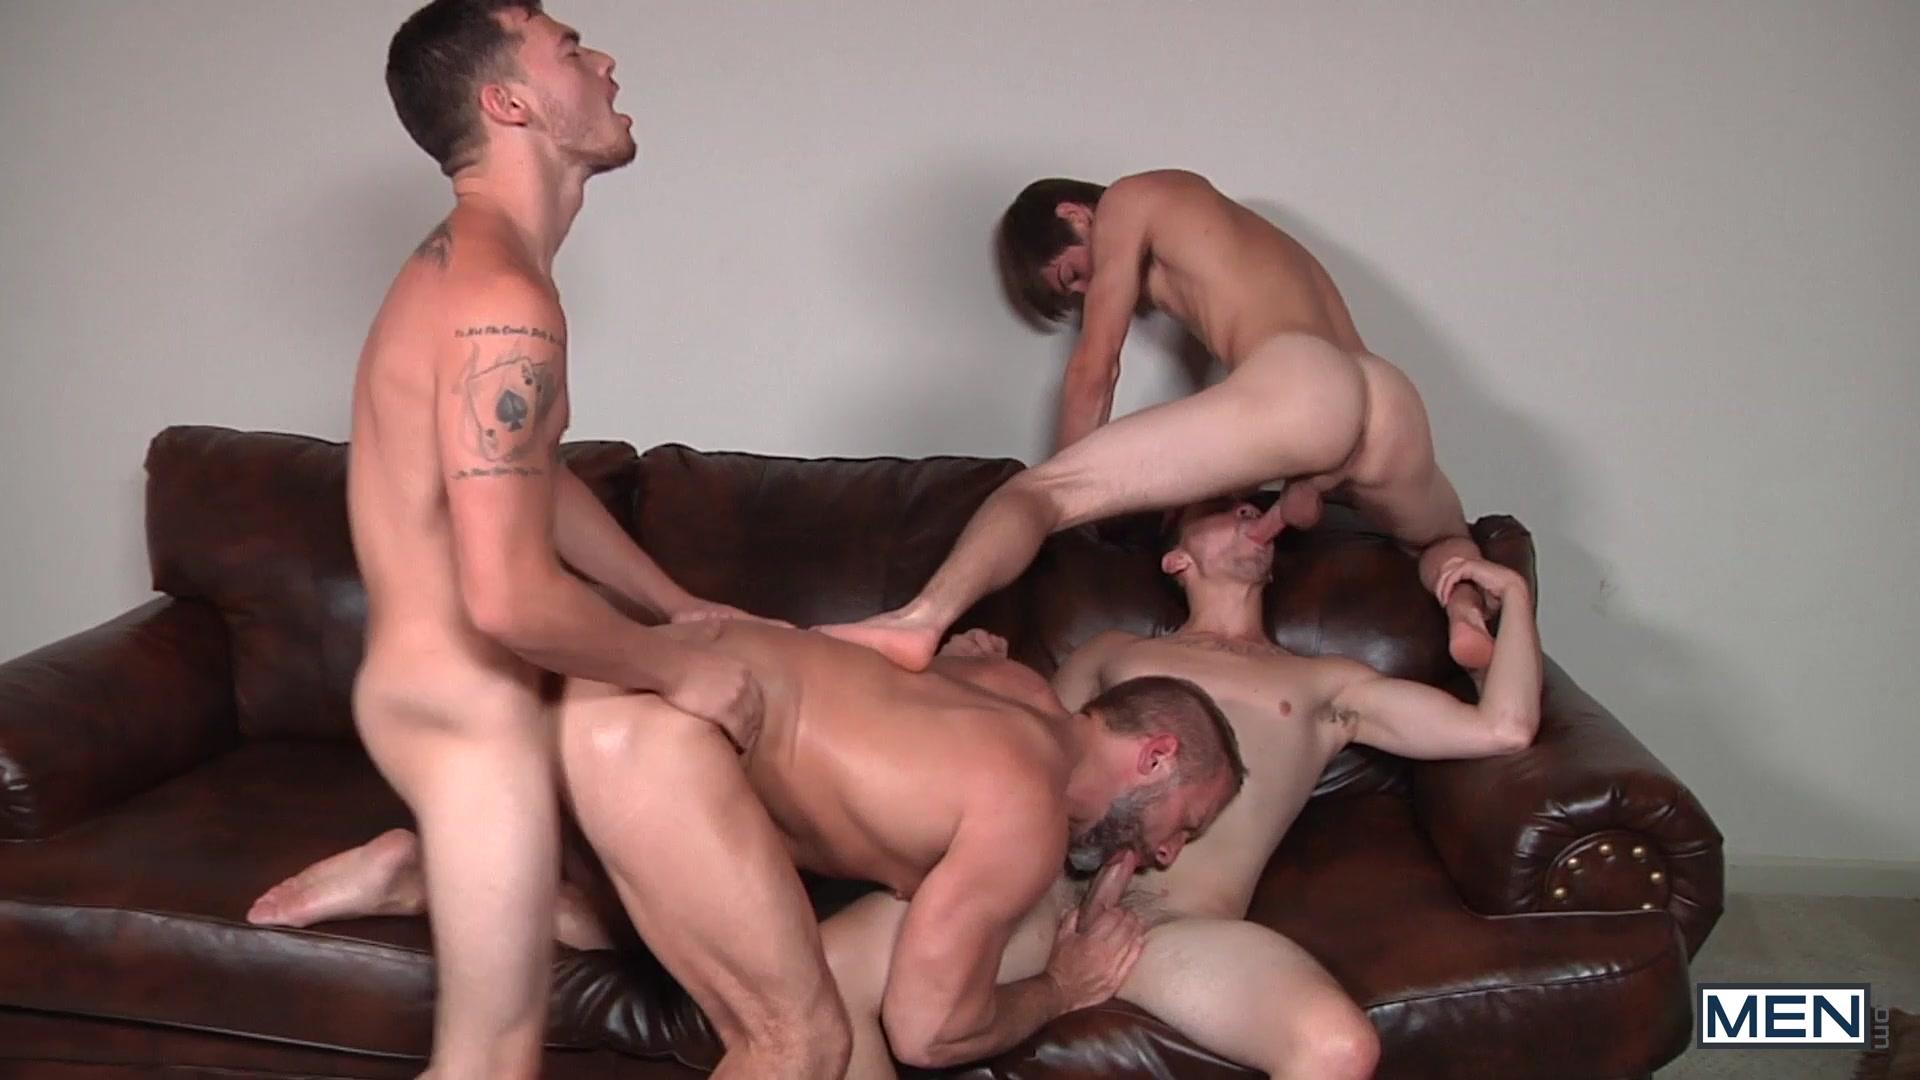 Watch Stepfather's Secret Part 8 – Asher Hawk – Dirk Caber – Johnny Rapid – Trevor Spade – Jo – Jizz Orgy (MEN.COM) Gay Porn Tube Videos Gifs And Free XXX HD Sex Movies Photos Online